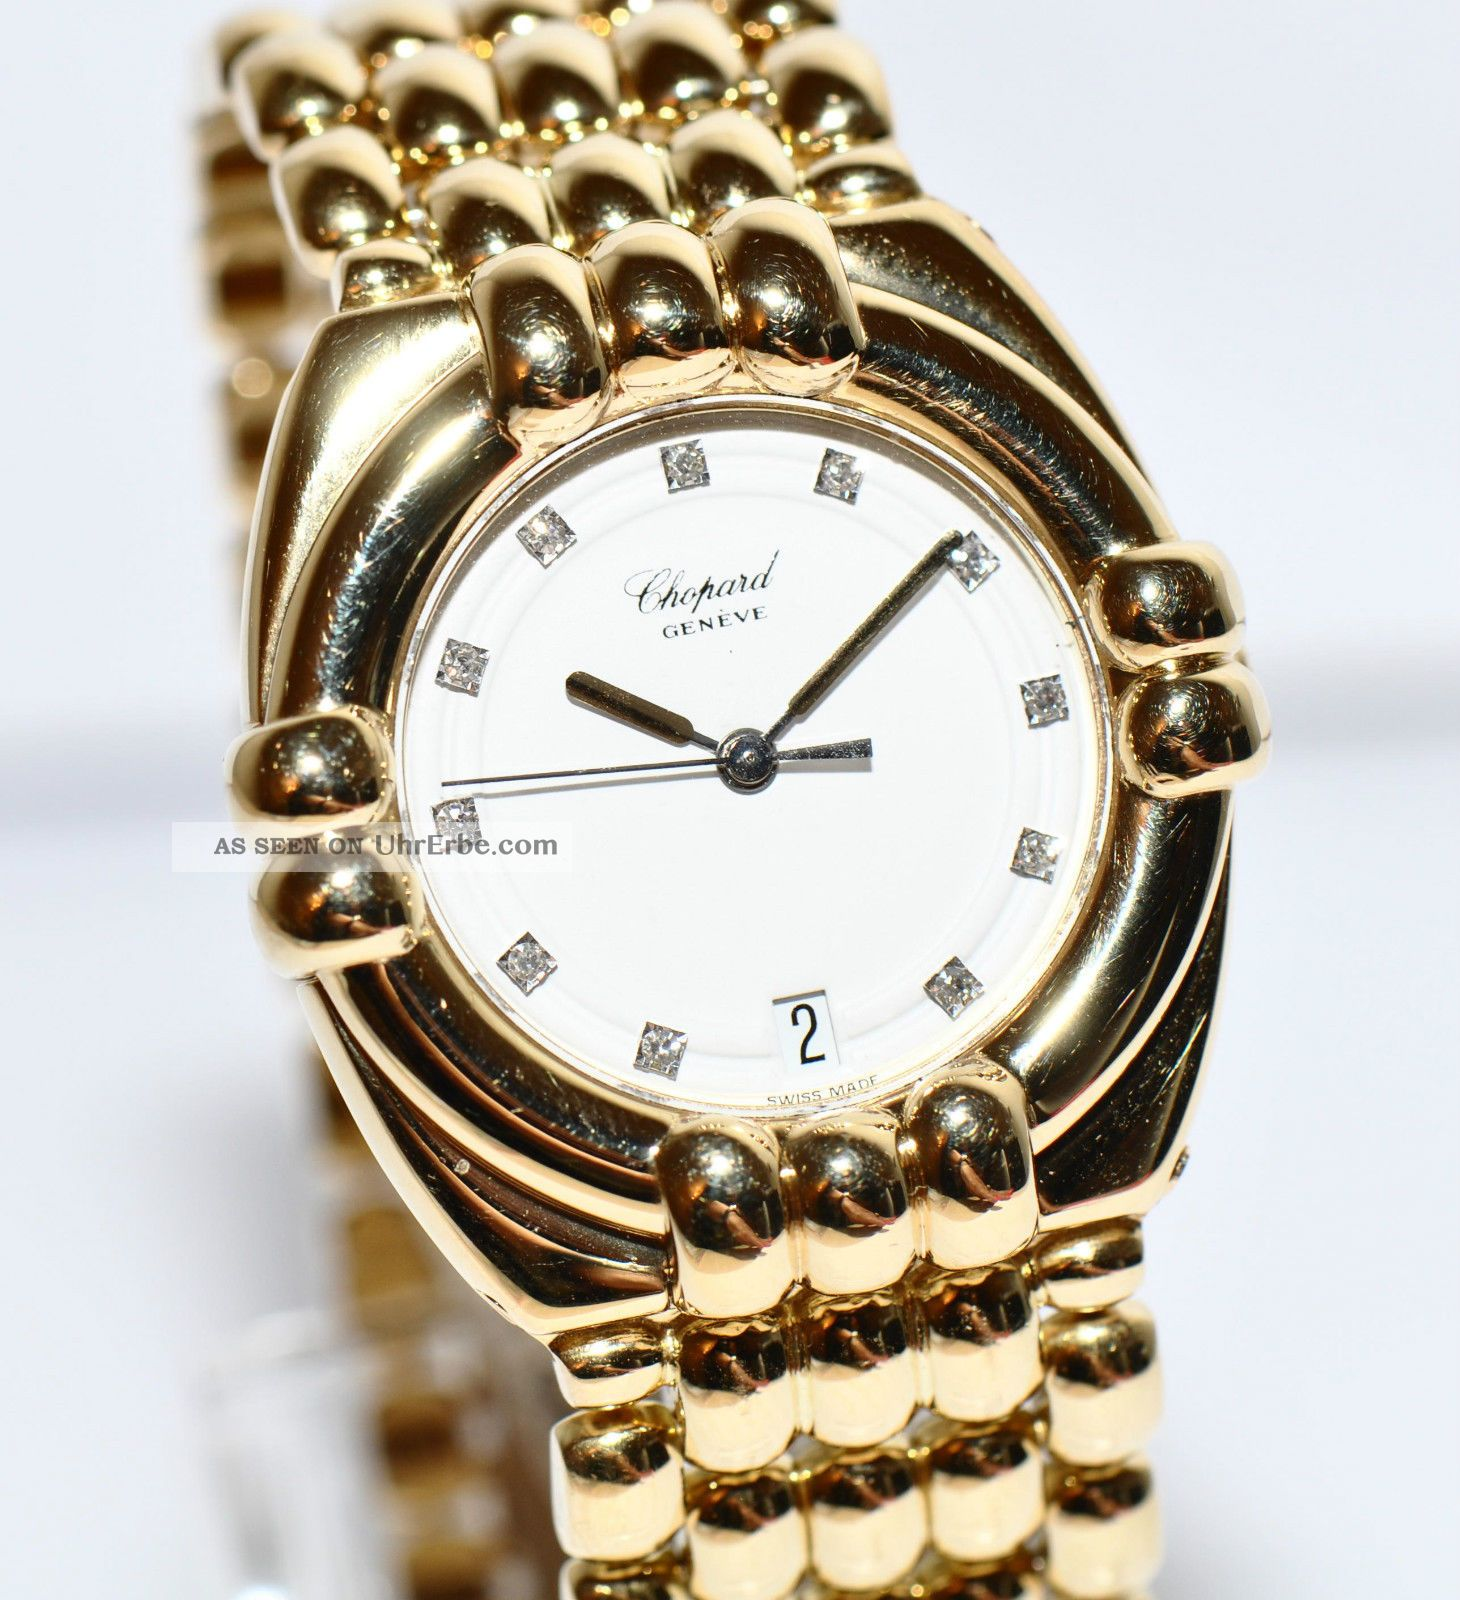 Chopard armbanduhr gold